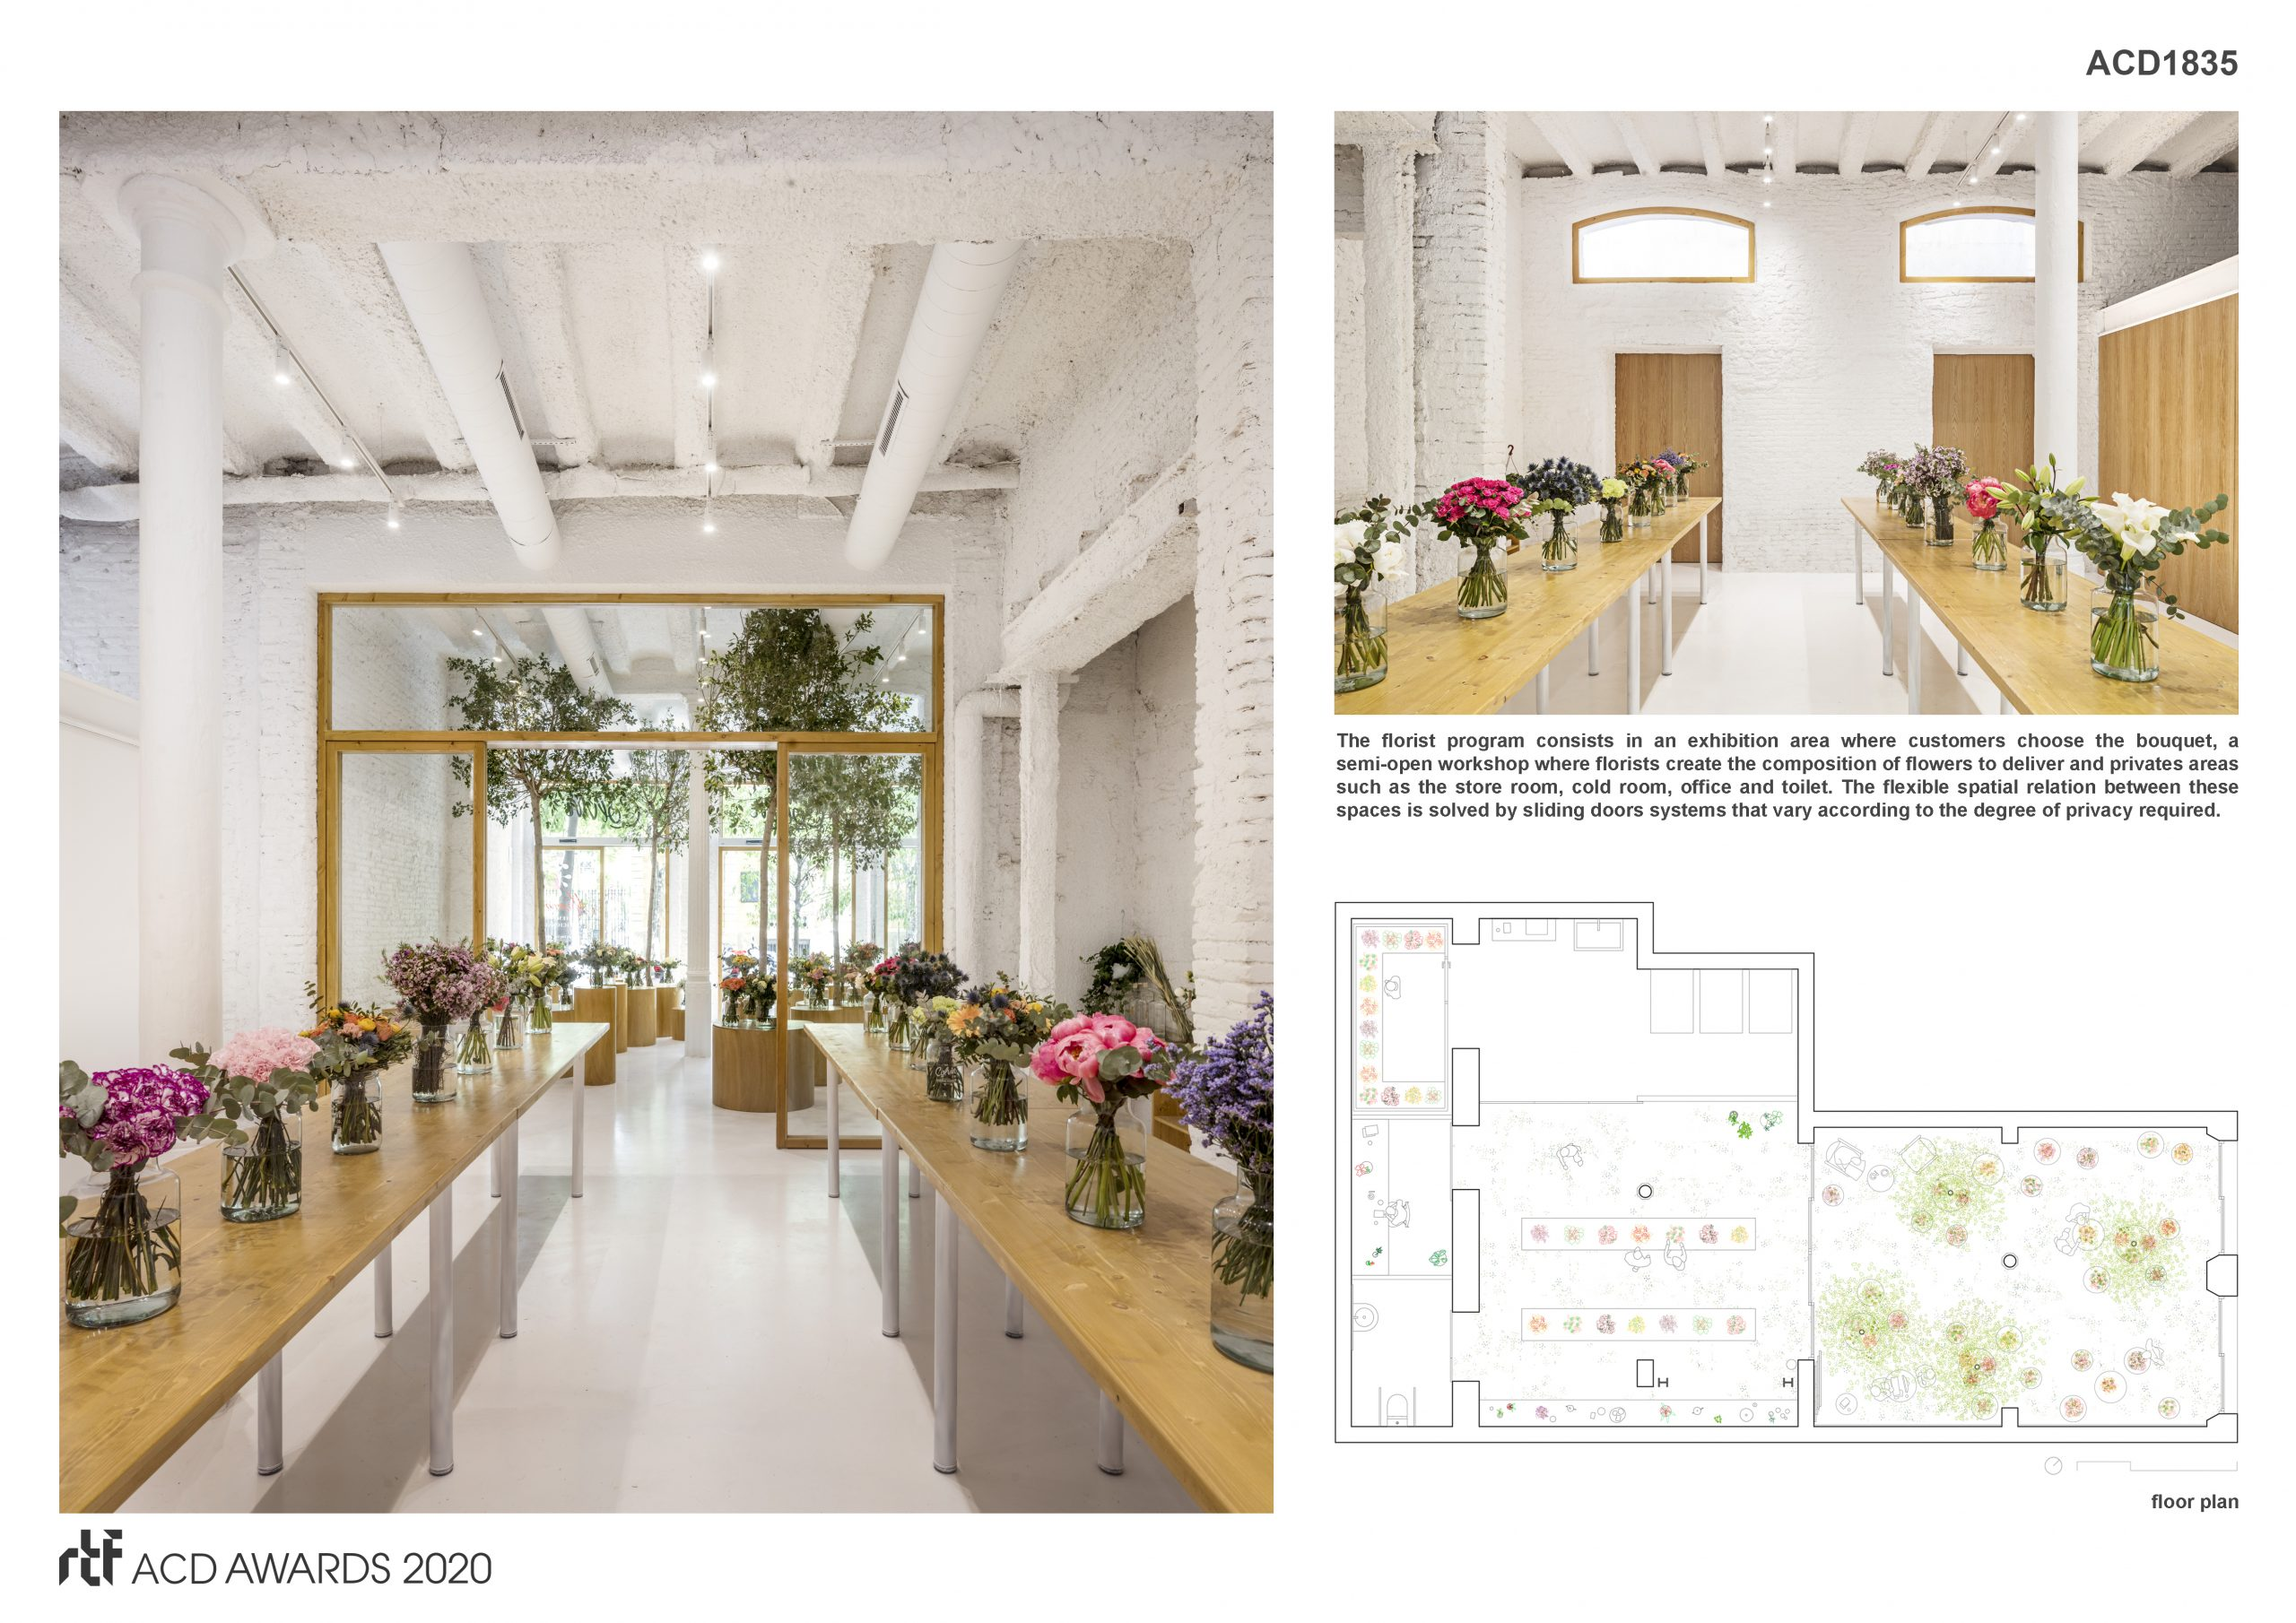 Colvin Florist By Roman Izquierdo Bouldstridge - Sheet3